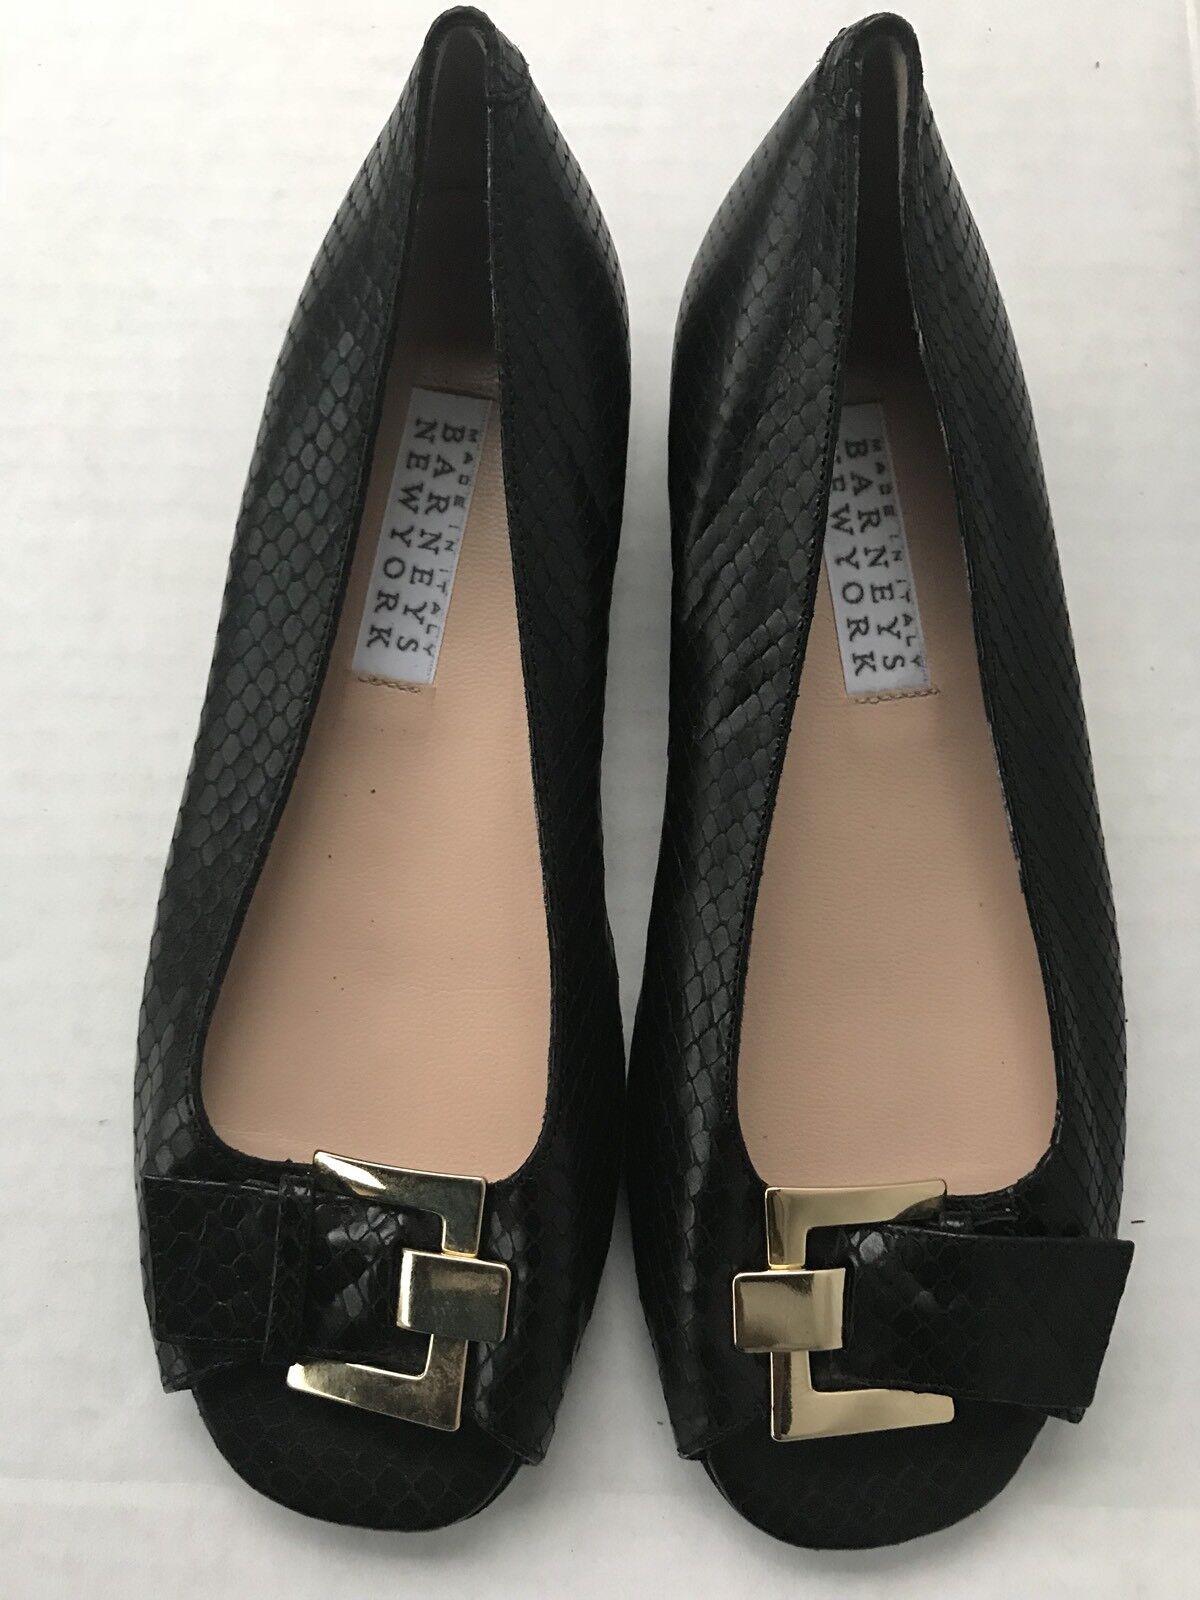 Barneys new york Womens Leather Open Toe Flats Black Size 6.5 US 36.5